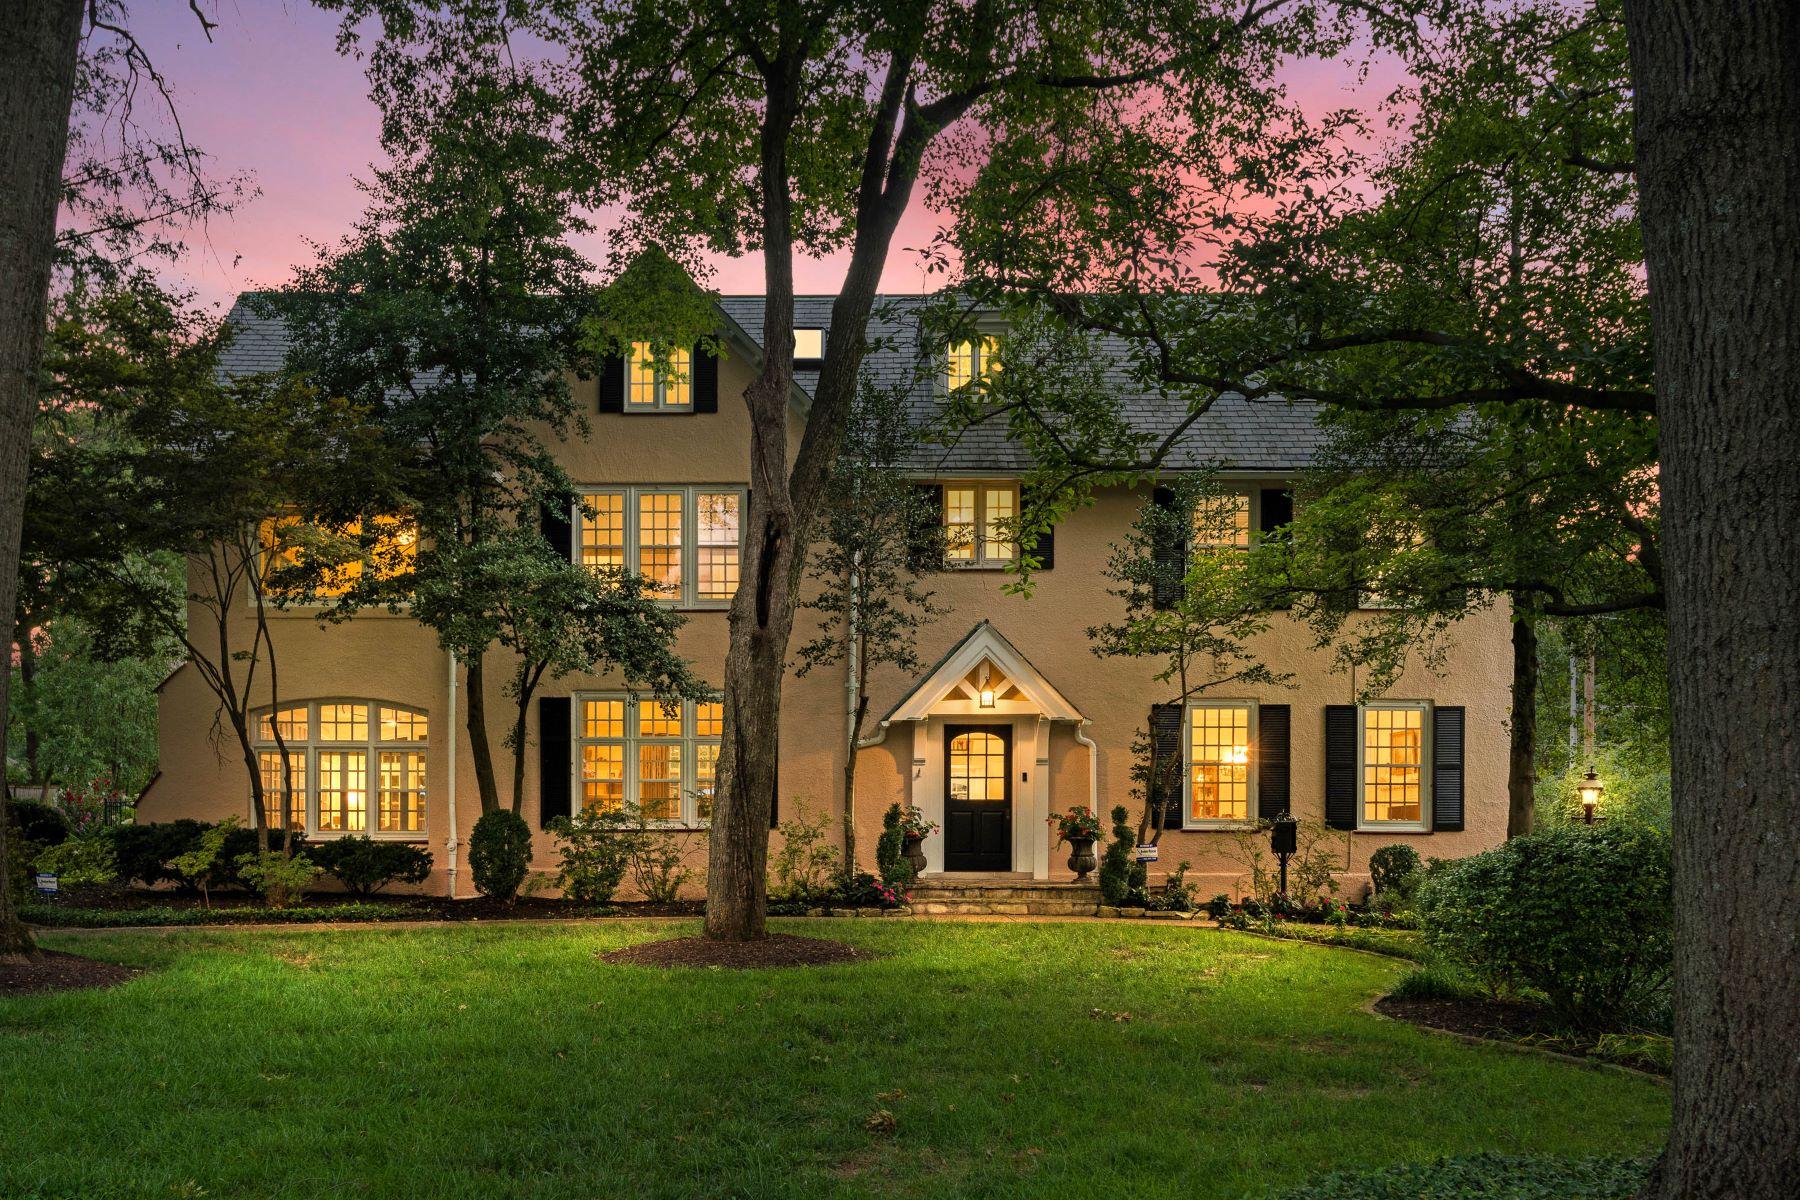 Single Family Homes for Sale at Gracious Historic Kirkwood Home 333 Dickson Street Kirkwood, Missouri 63122 United States